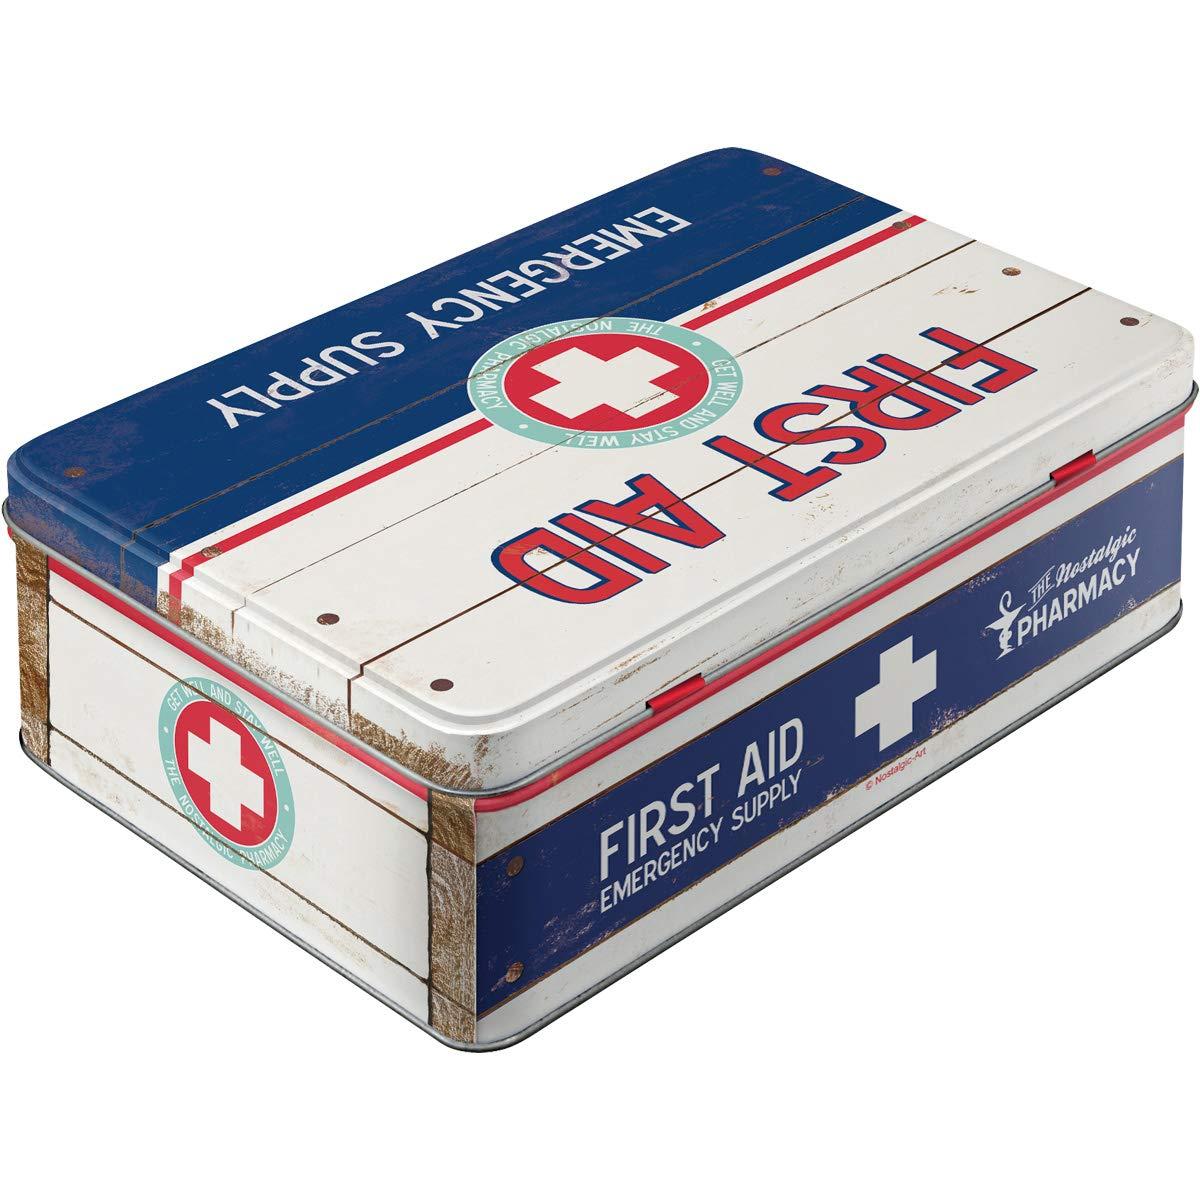 Dise/ño de Primeros Auxilios para Tarro de Caja met/álica de Primeros Auxilios para Caja de Metal Plana